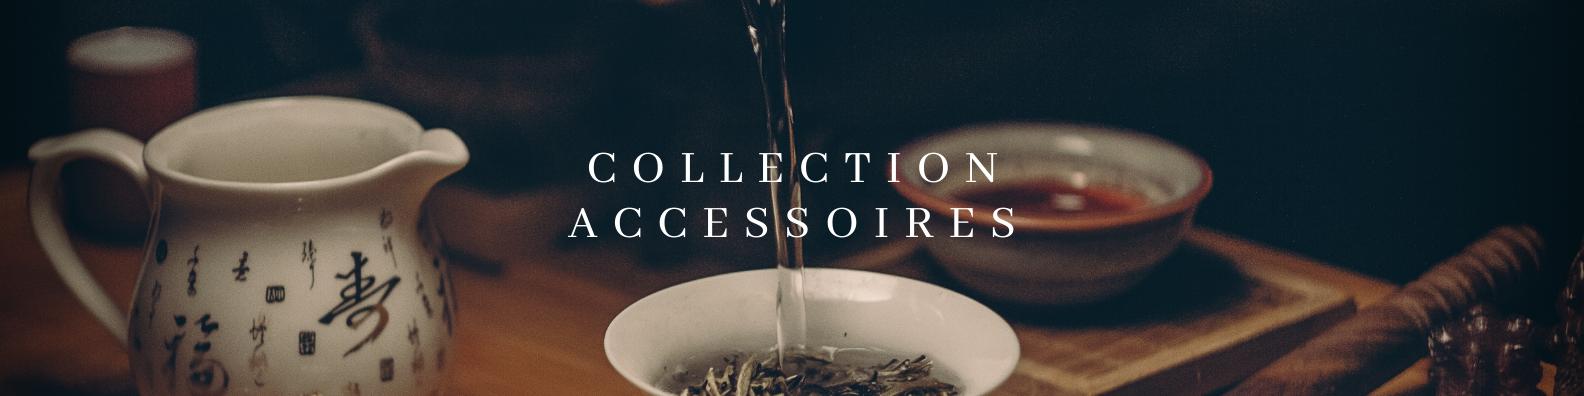 Collection_Accessoires_.png